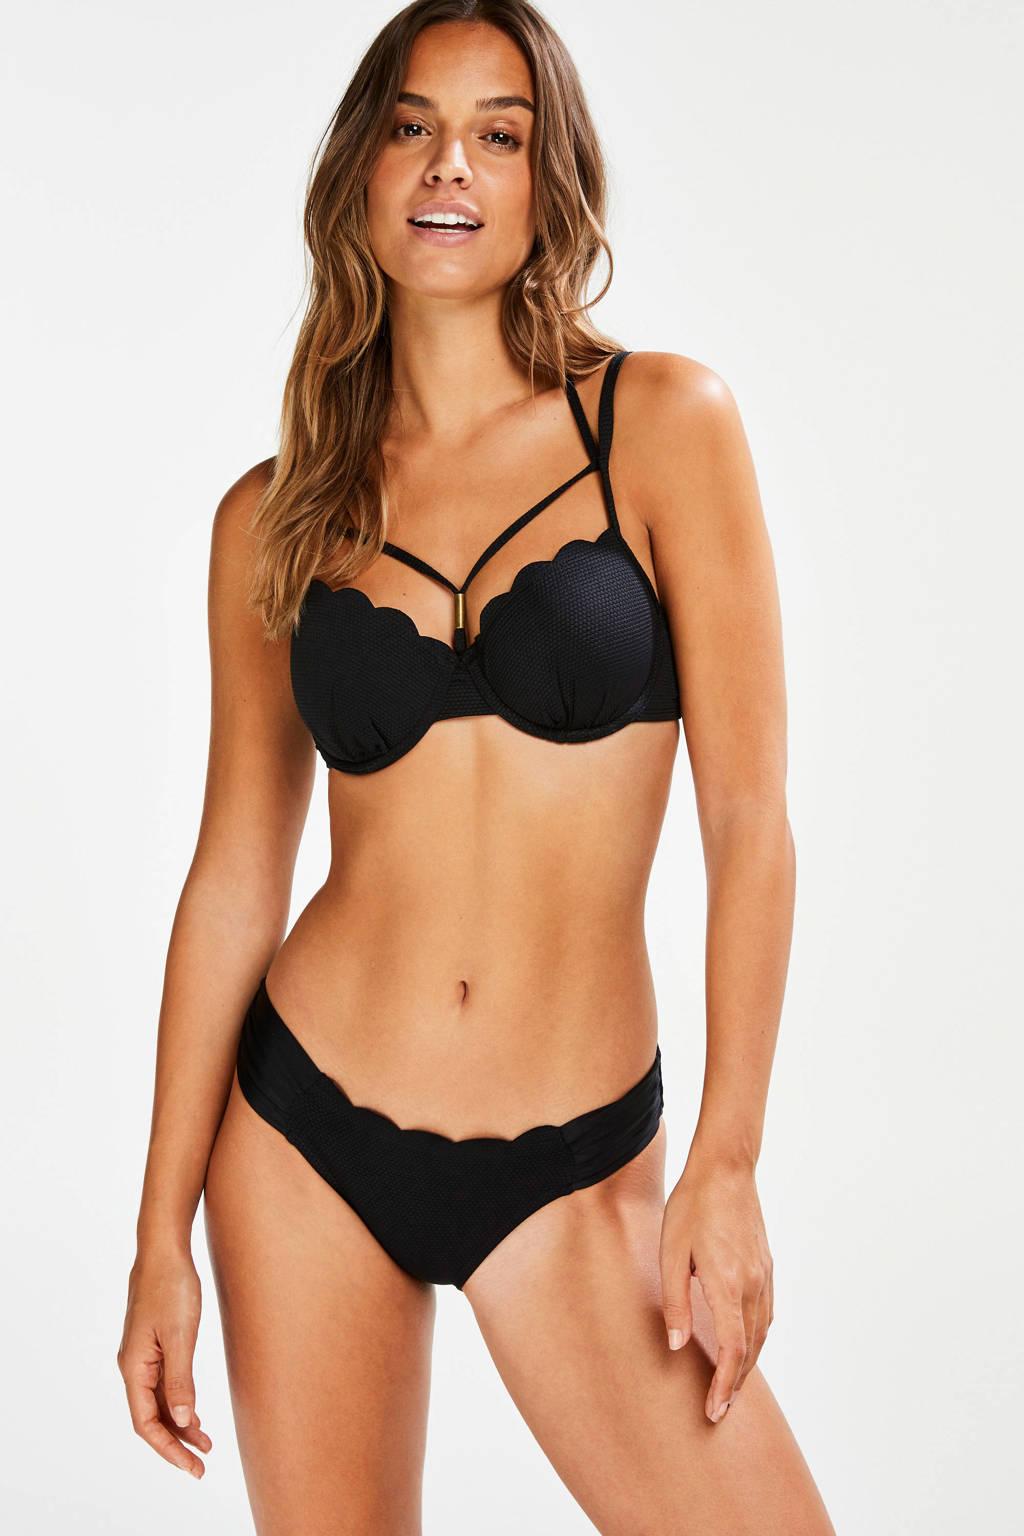 Hunkemöller bikinibroekje Scallop Glam met schulprand zwart, Zwart